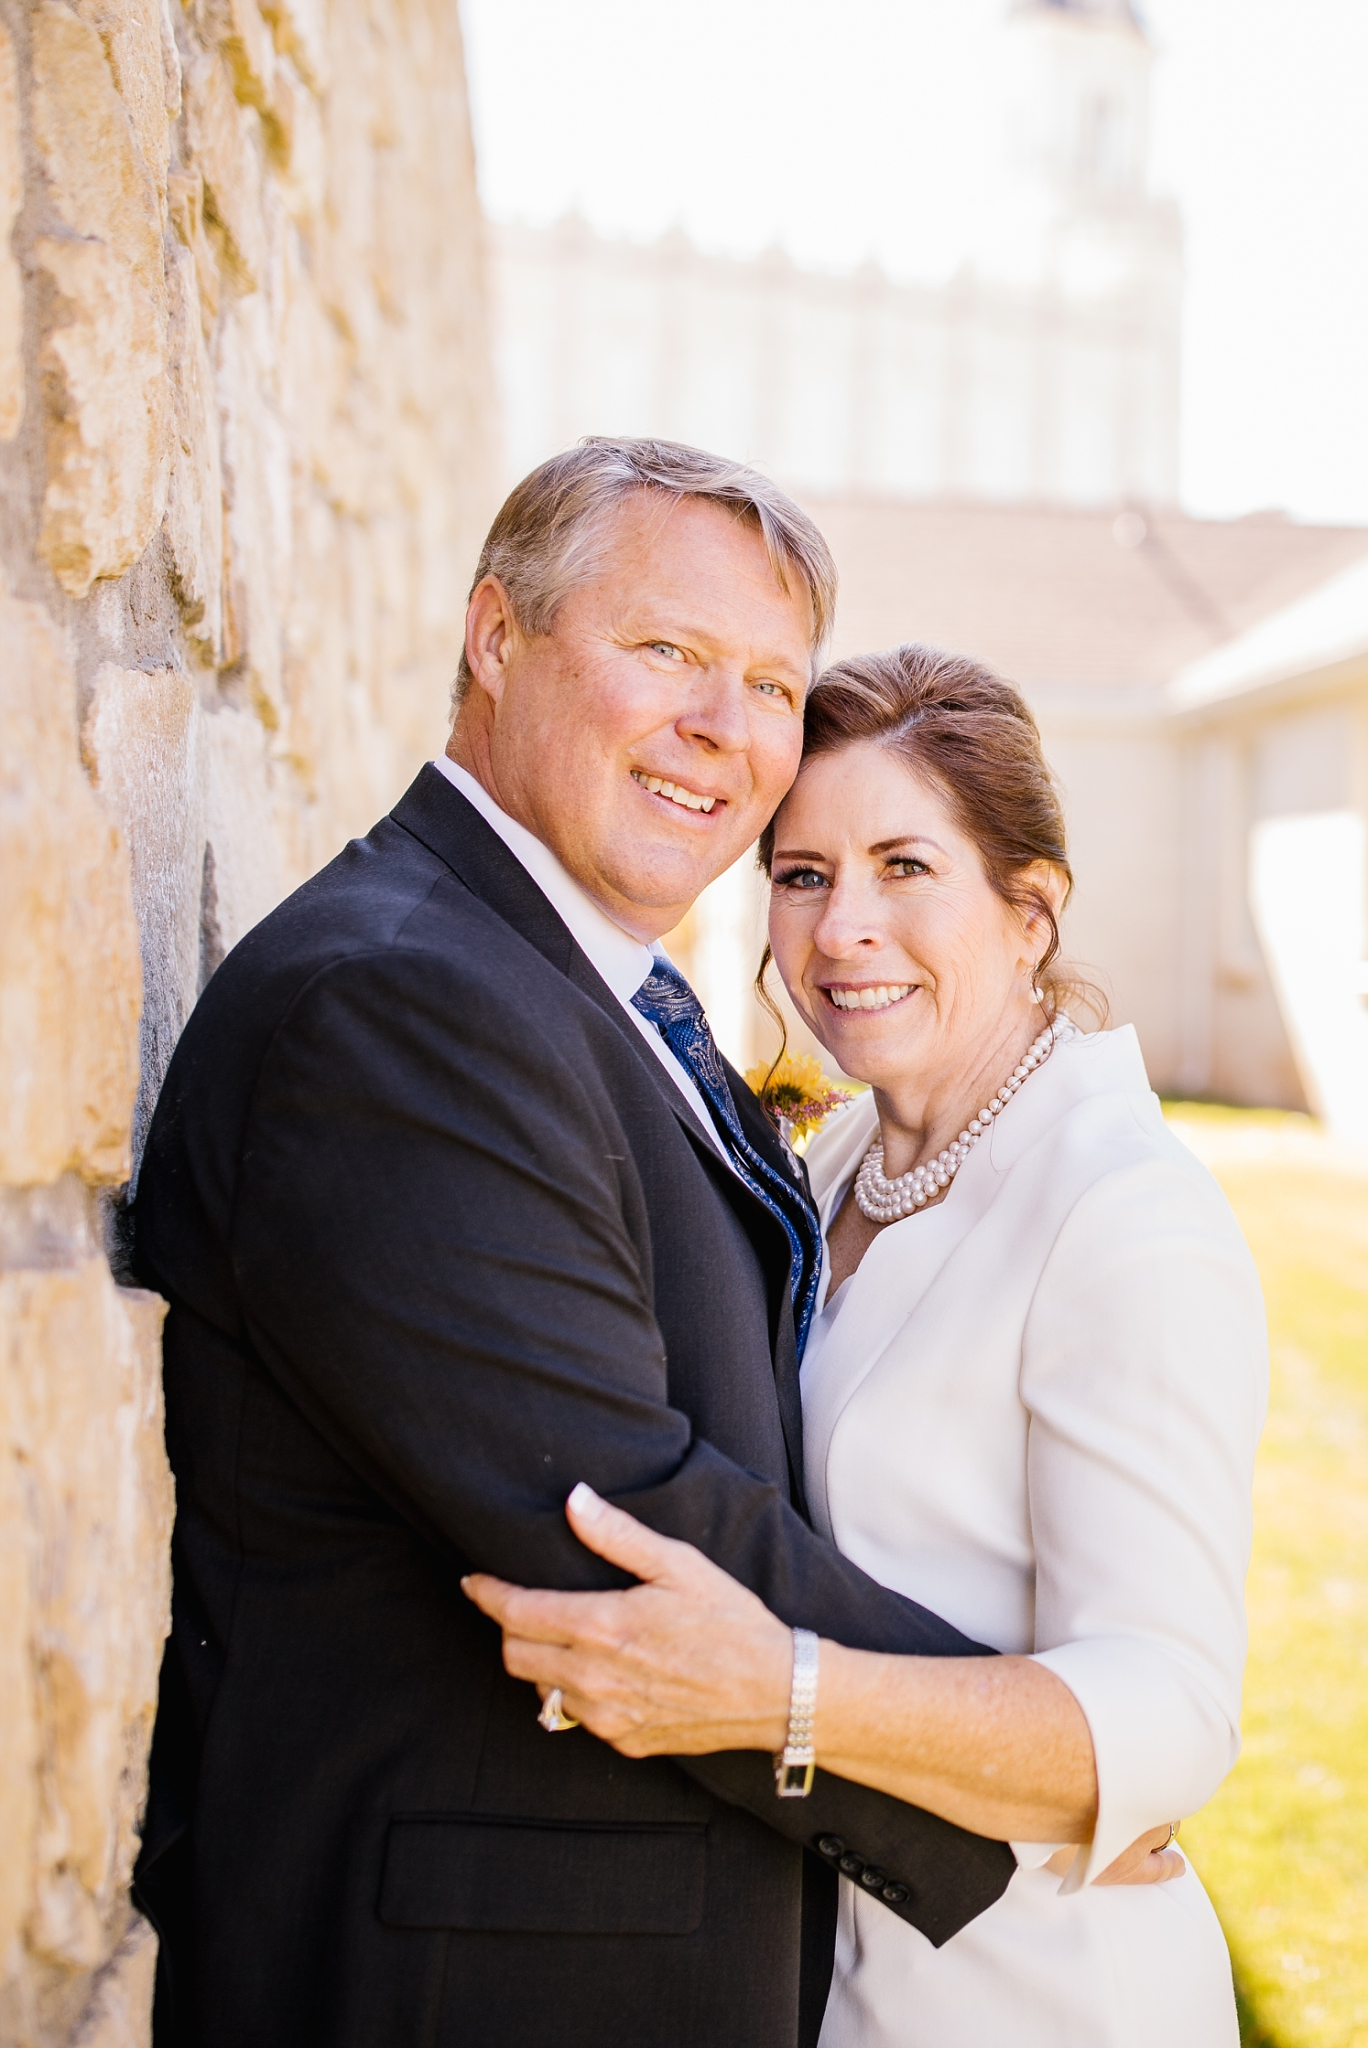 PDWeddingDay-144_Lizzie-B-Imagery-Utah-Wedding-Photographer-Park-City-Salt-Lake-City-Manti-Utah-Temple.jpg